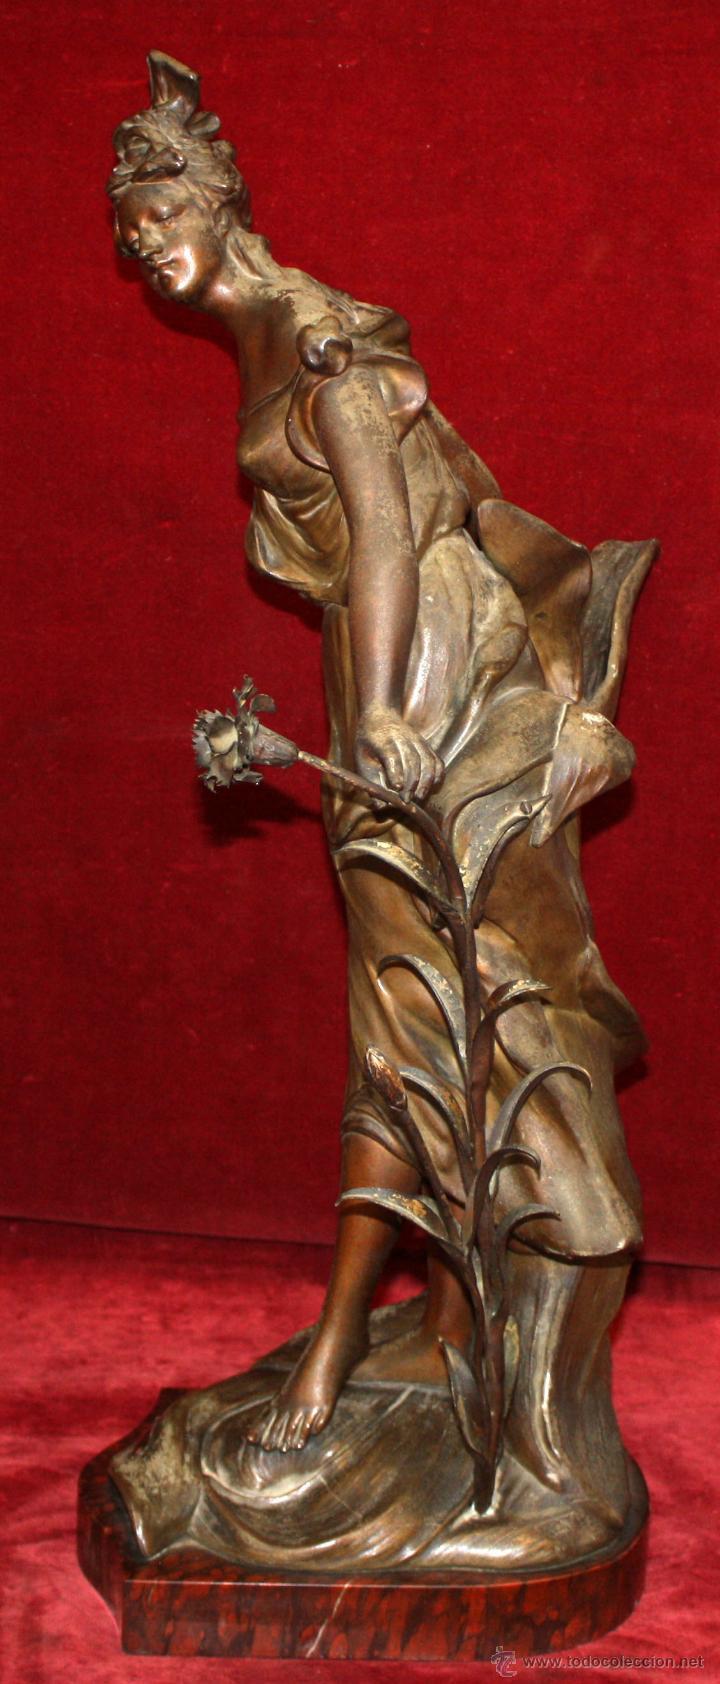 Arte: FIRMADO TAÏRO. ESCULTURA EN CALAMINA DE ÉPOCA MODERNISTA. TITULADA CEILLET - Foto 5 - 48955955